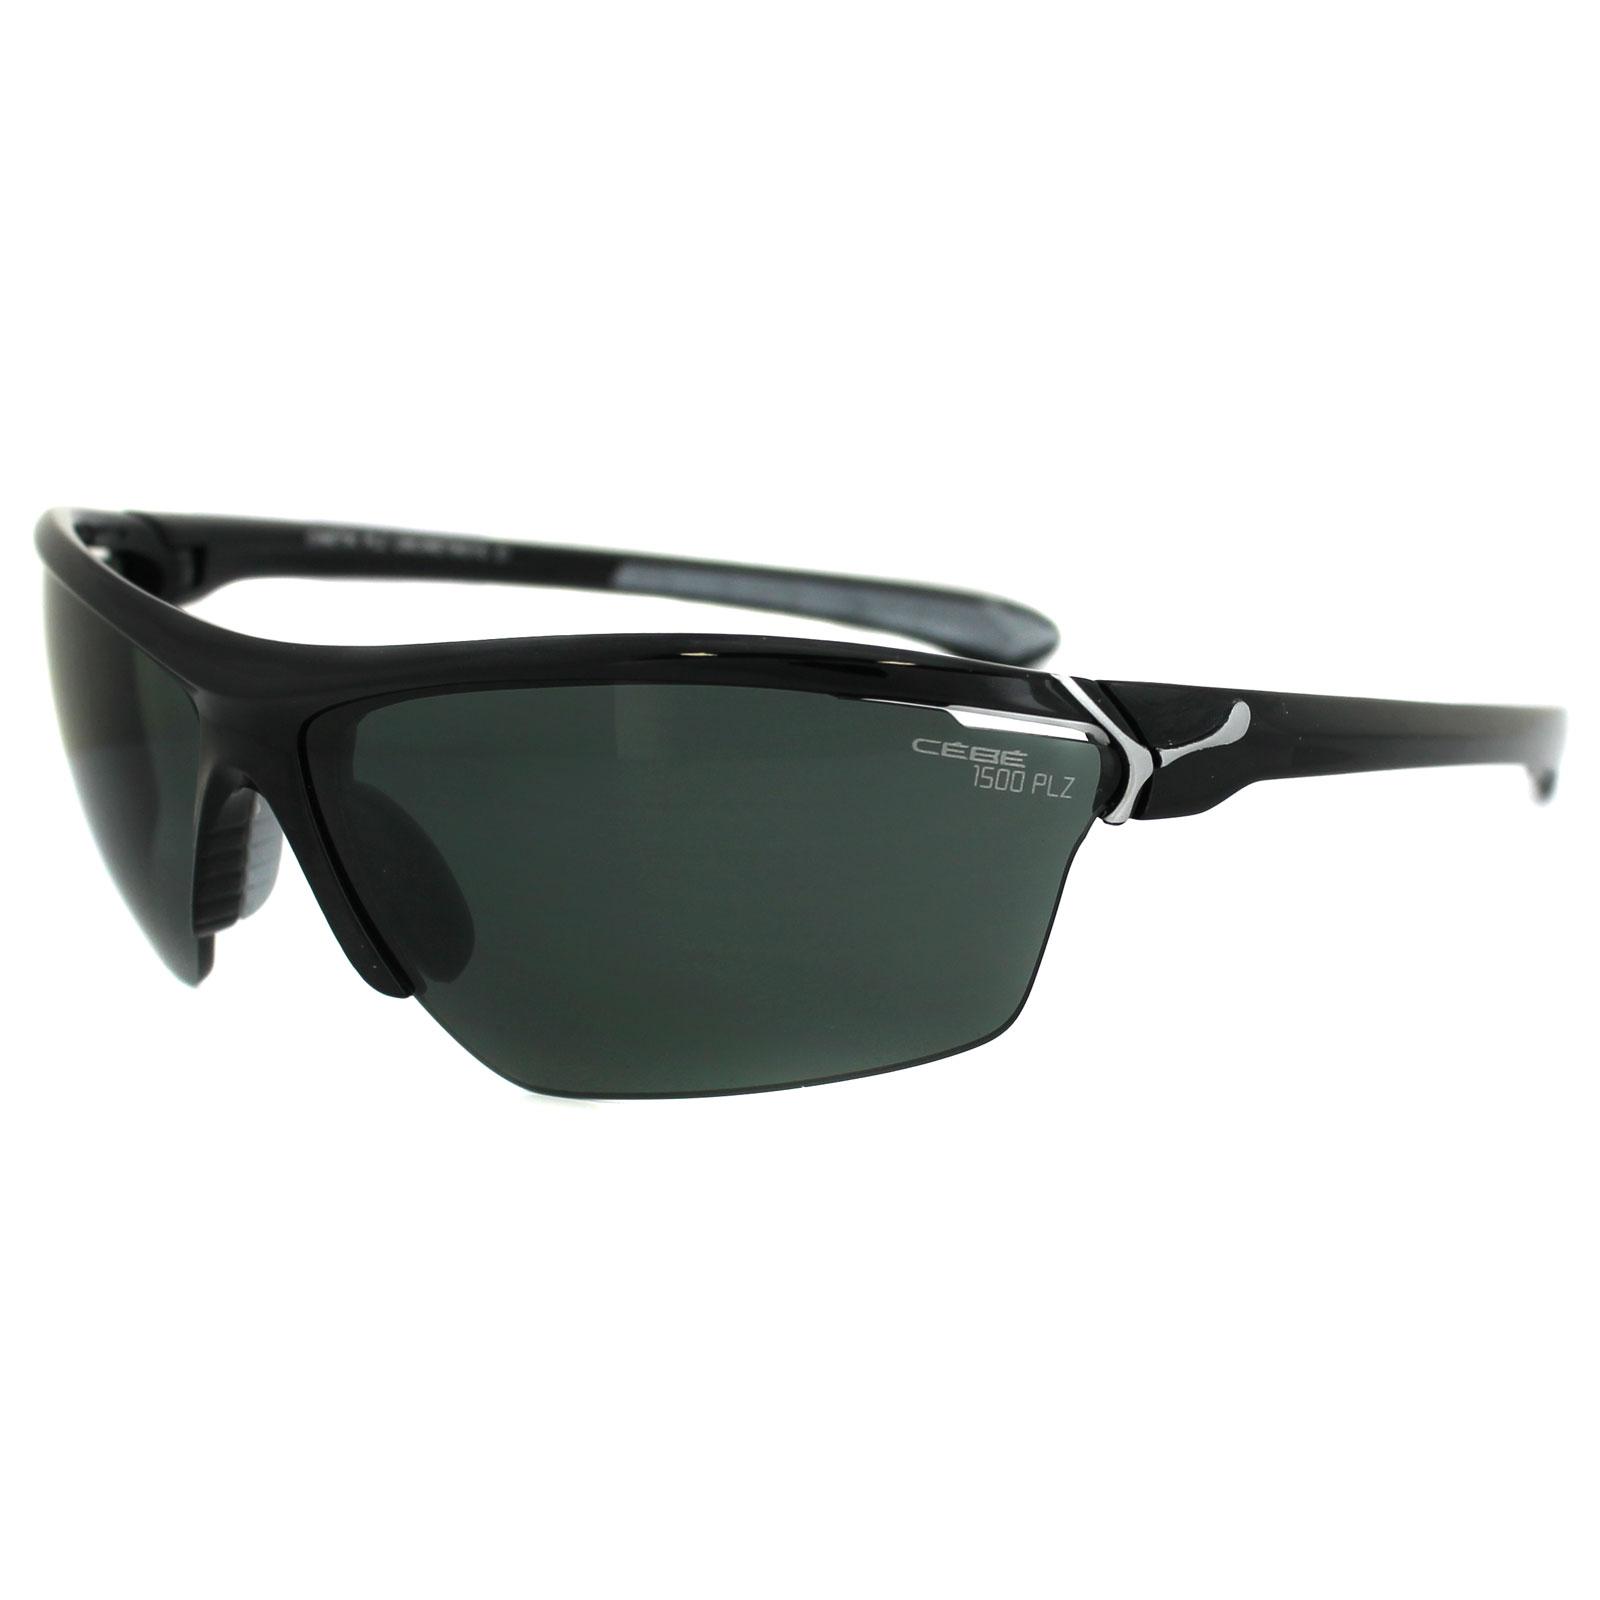 dd51a1038b Cebe Sunglasses Cinetik CBCINETIK01G Black Grey Polarized